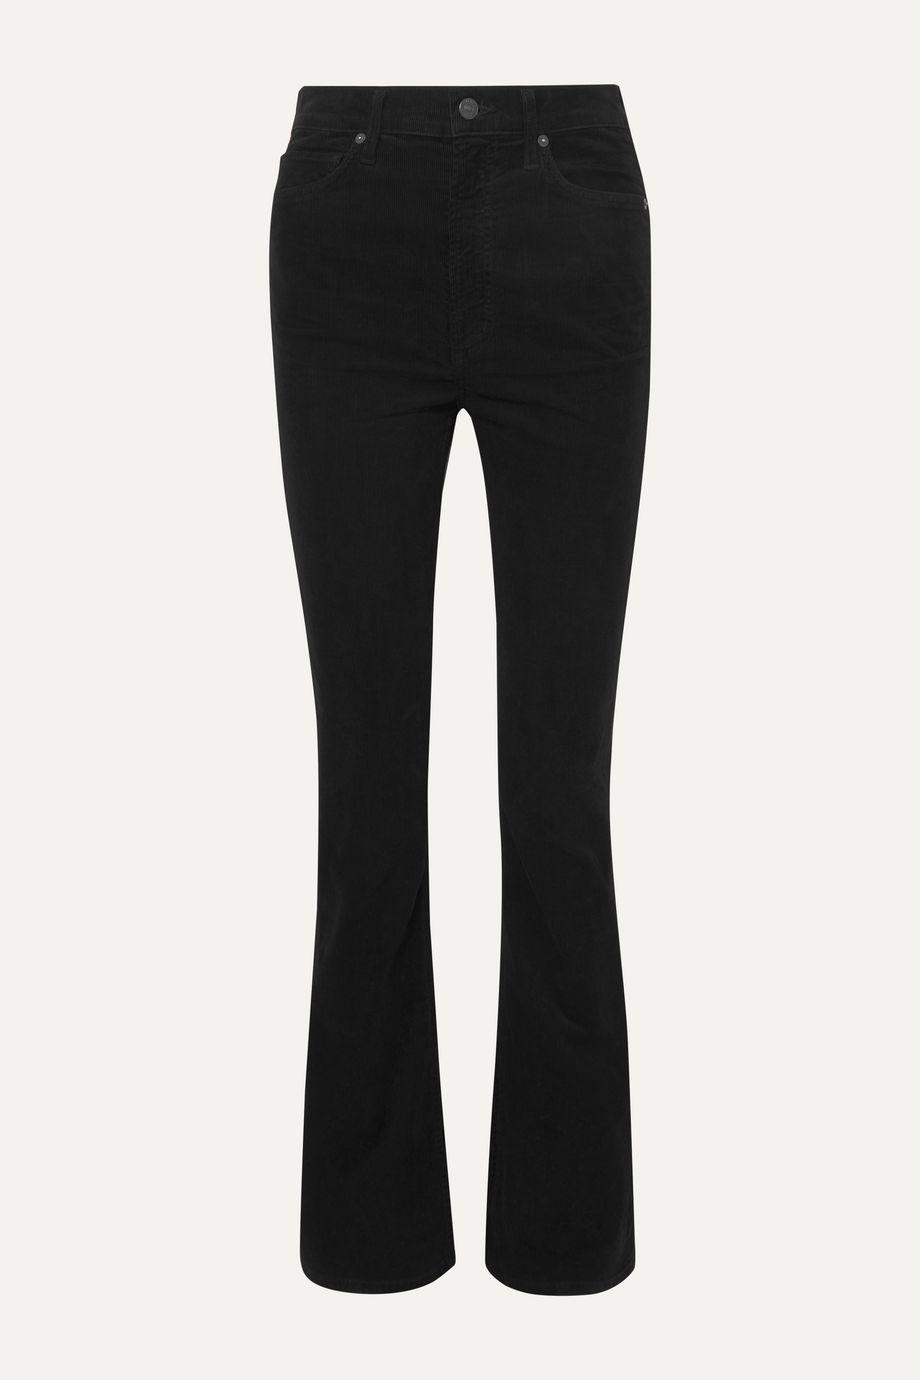 Citizens of Humanity Georgia cotton-corduroy bootcut pants